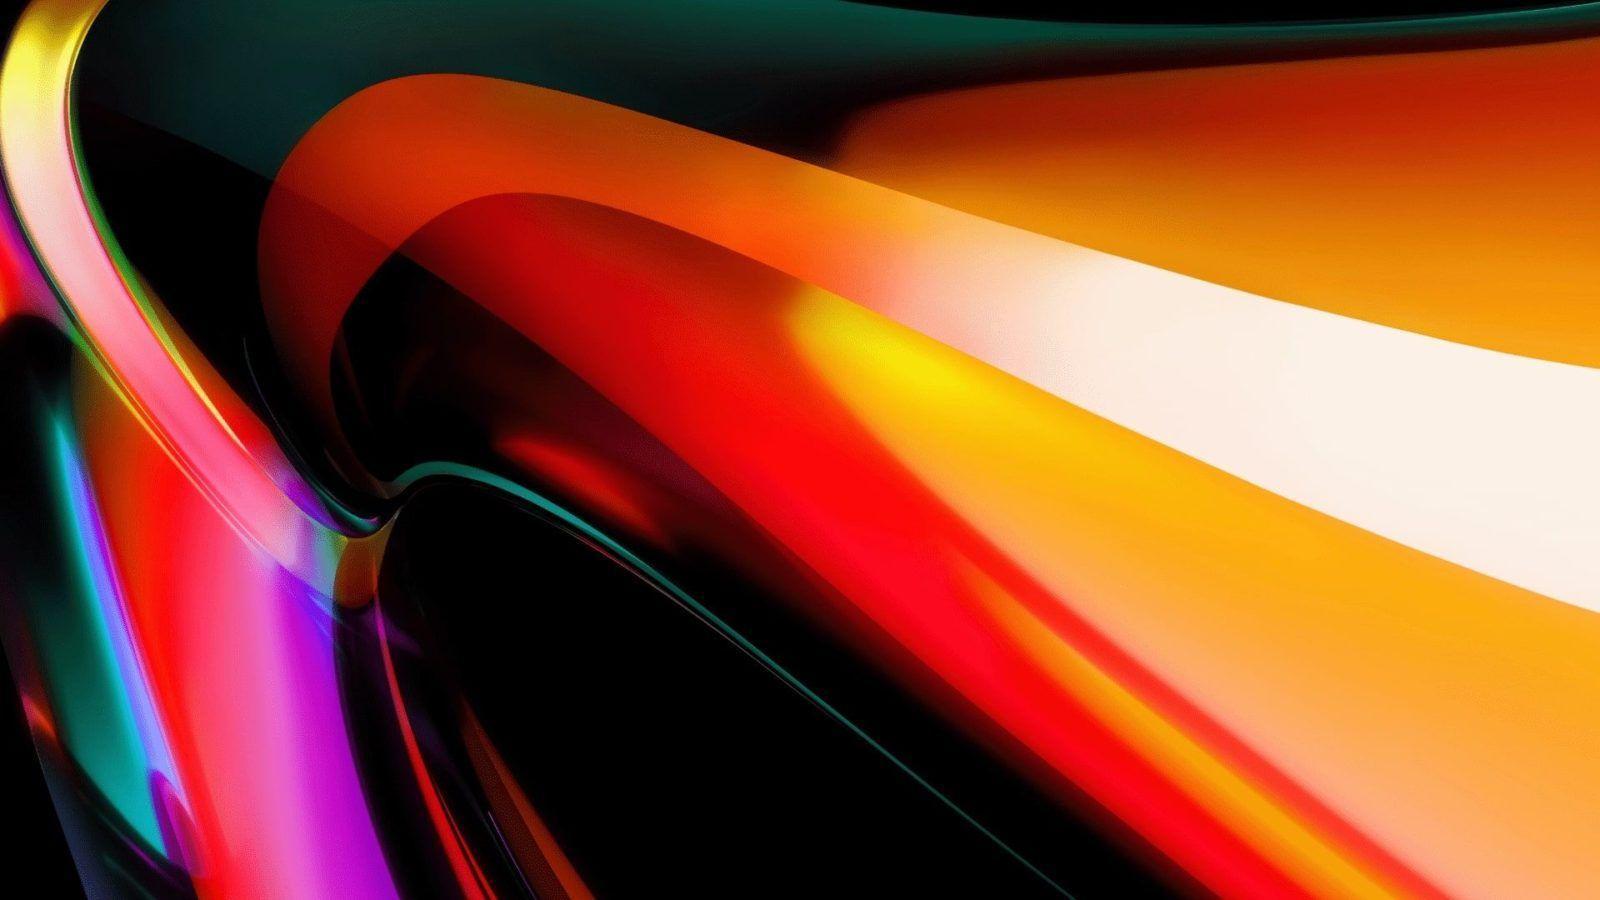 Macbook Pro 16 Wallpapers Top Free Macbook Pro 16 Backgrounds Wallpaperaccess